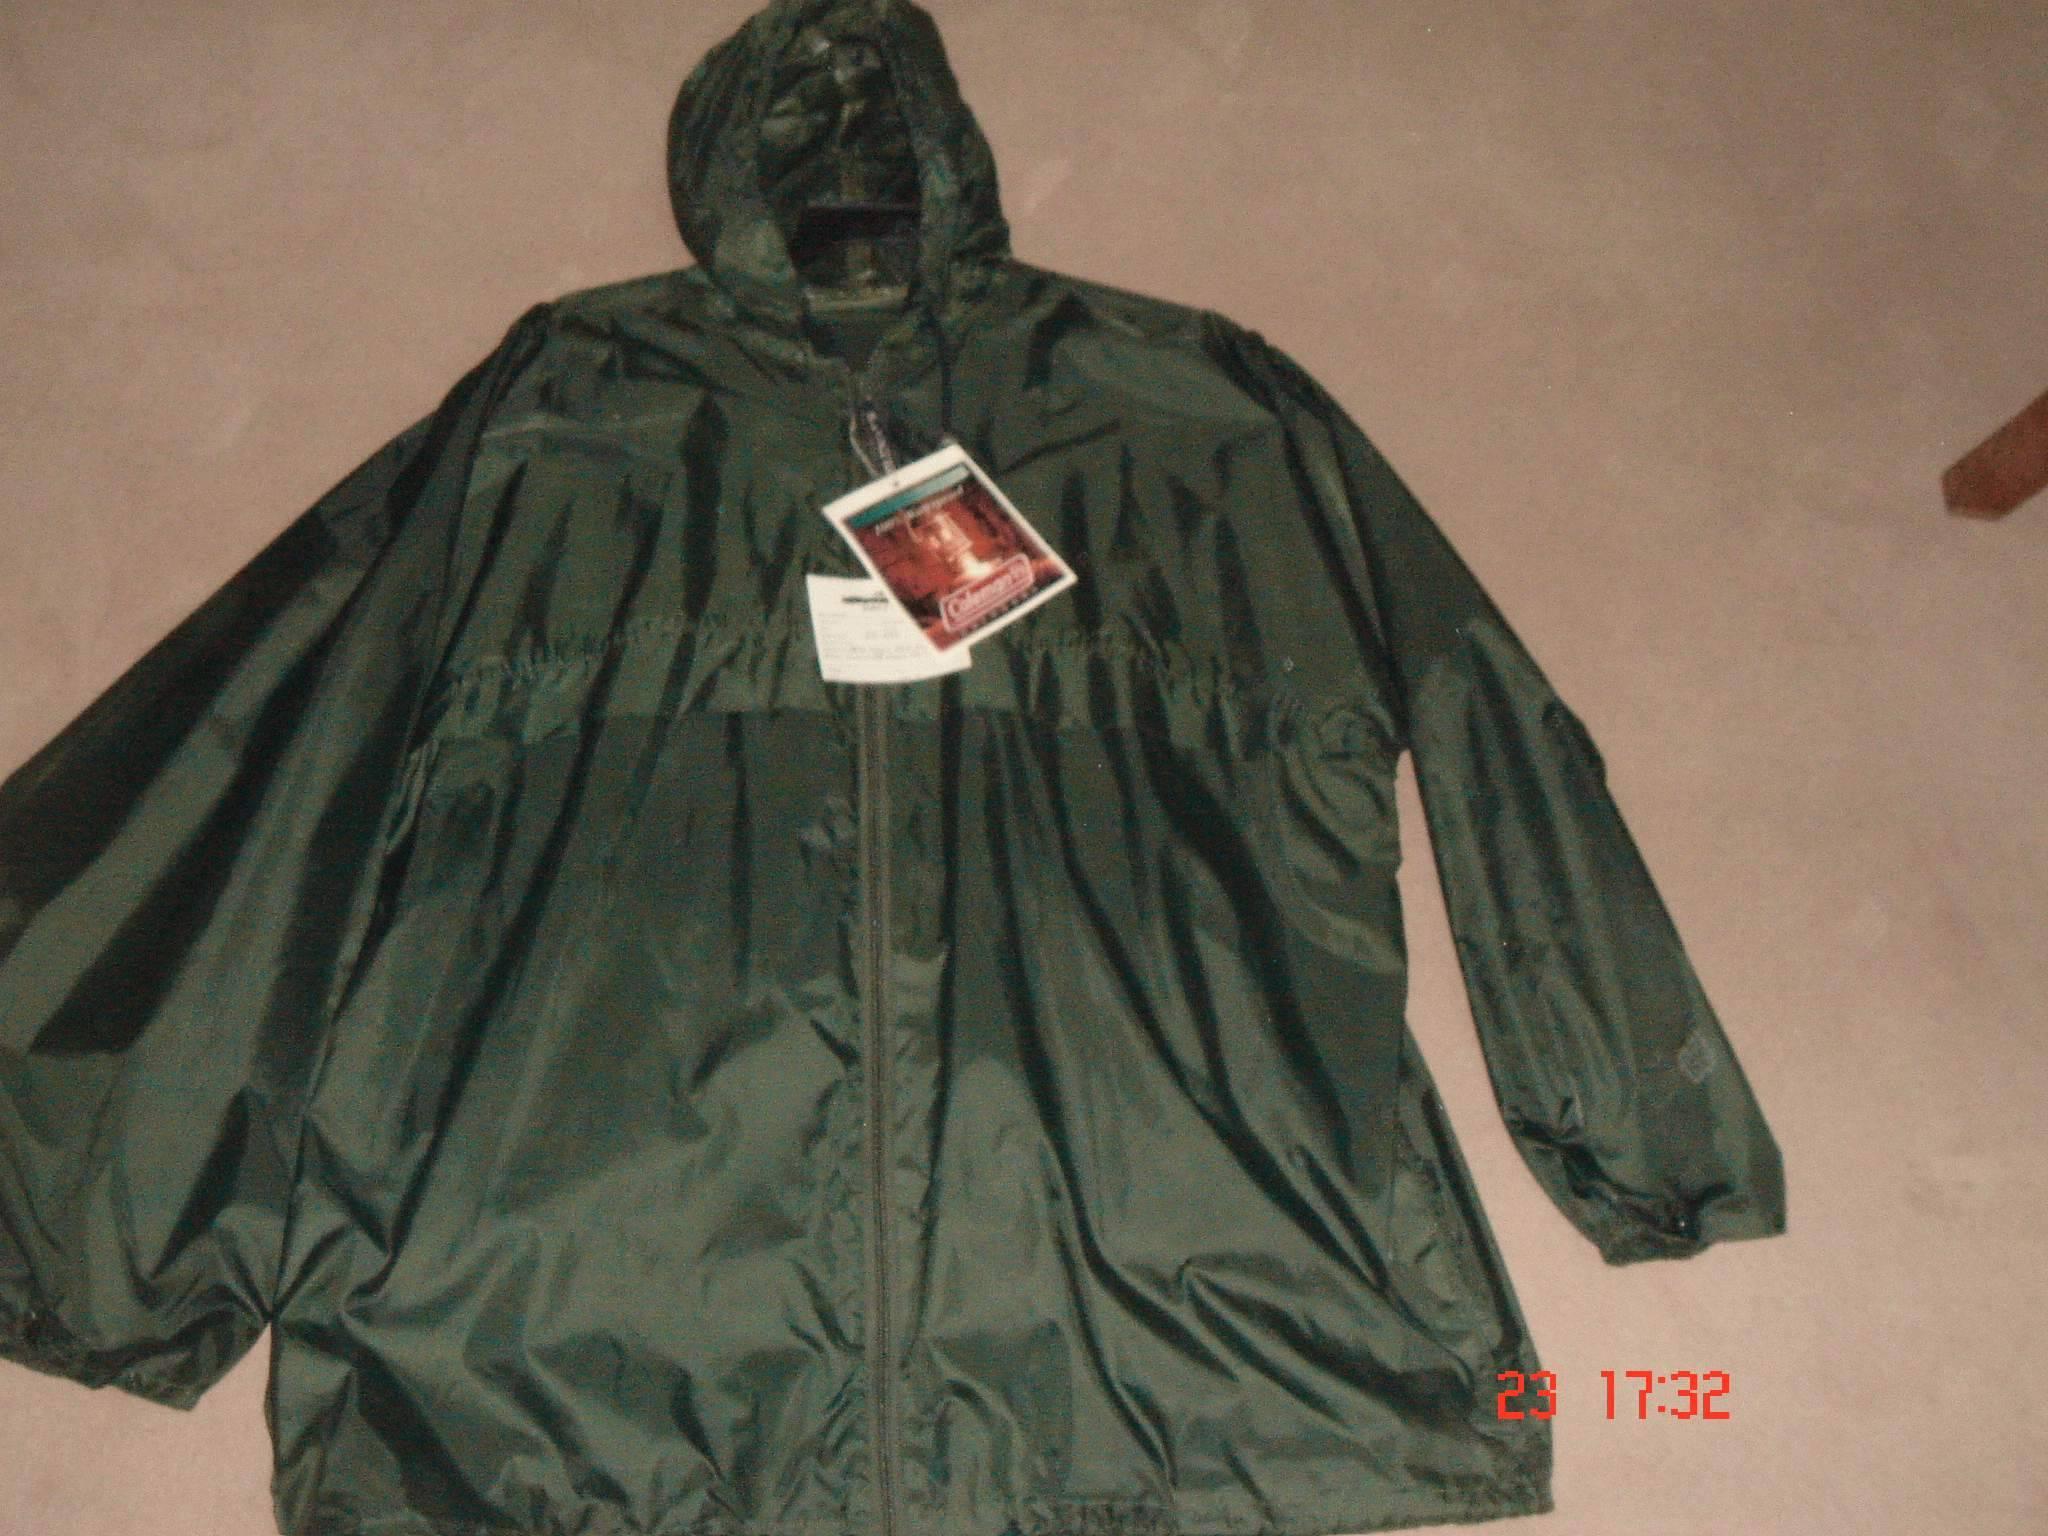 Water Proof Jacket With Hood